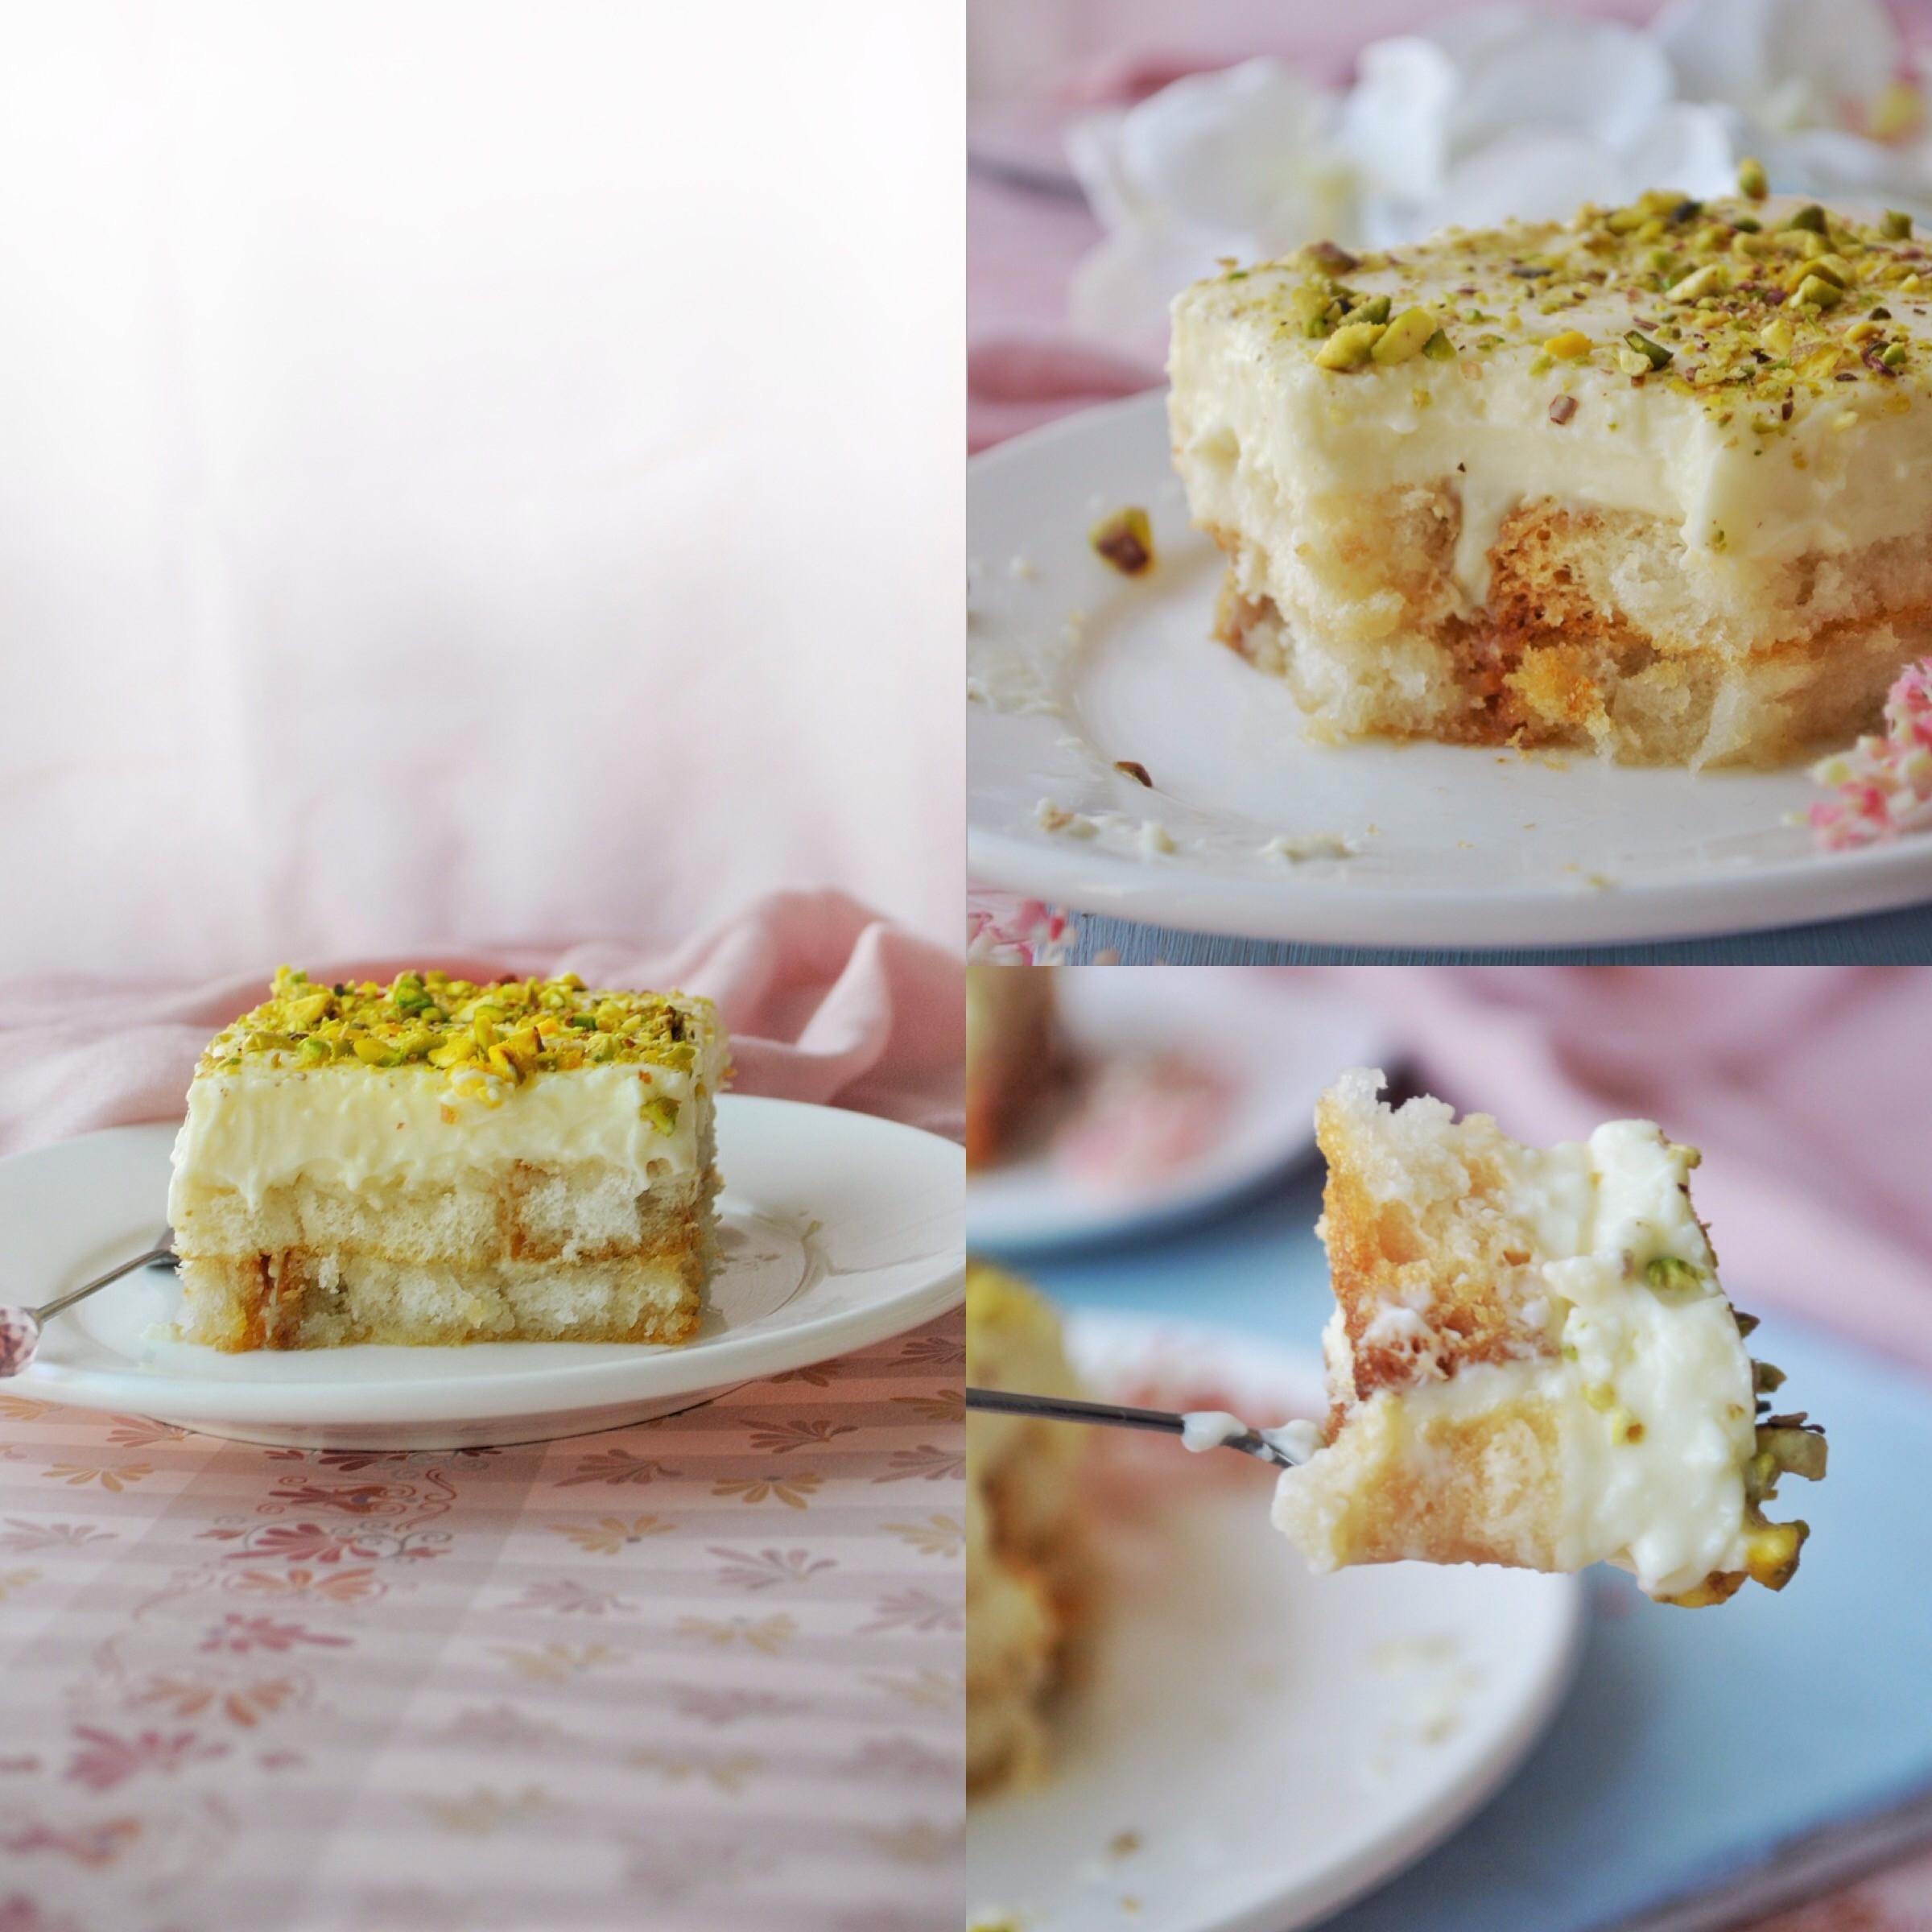 Middle Eastern Desert Recipes  Aish el Saraya Middle Eastern Dessert Savory&SweetFood